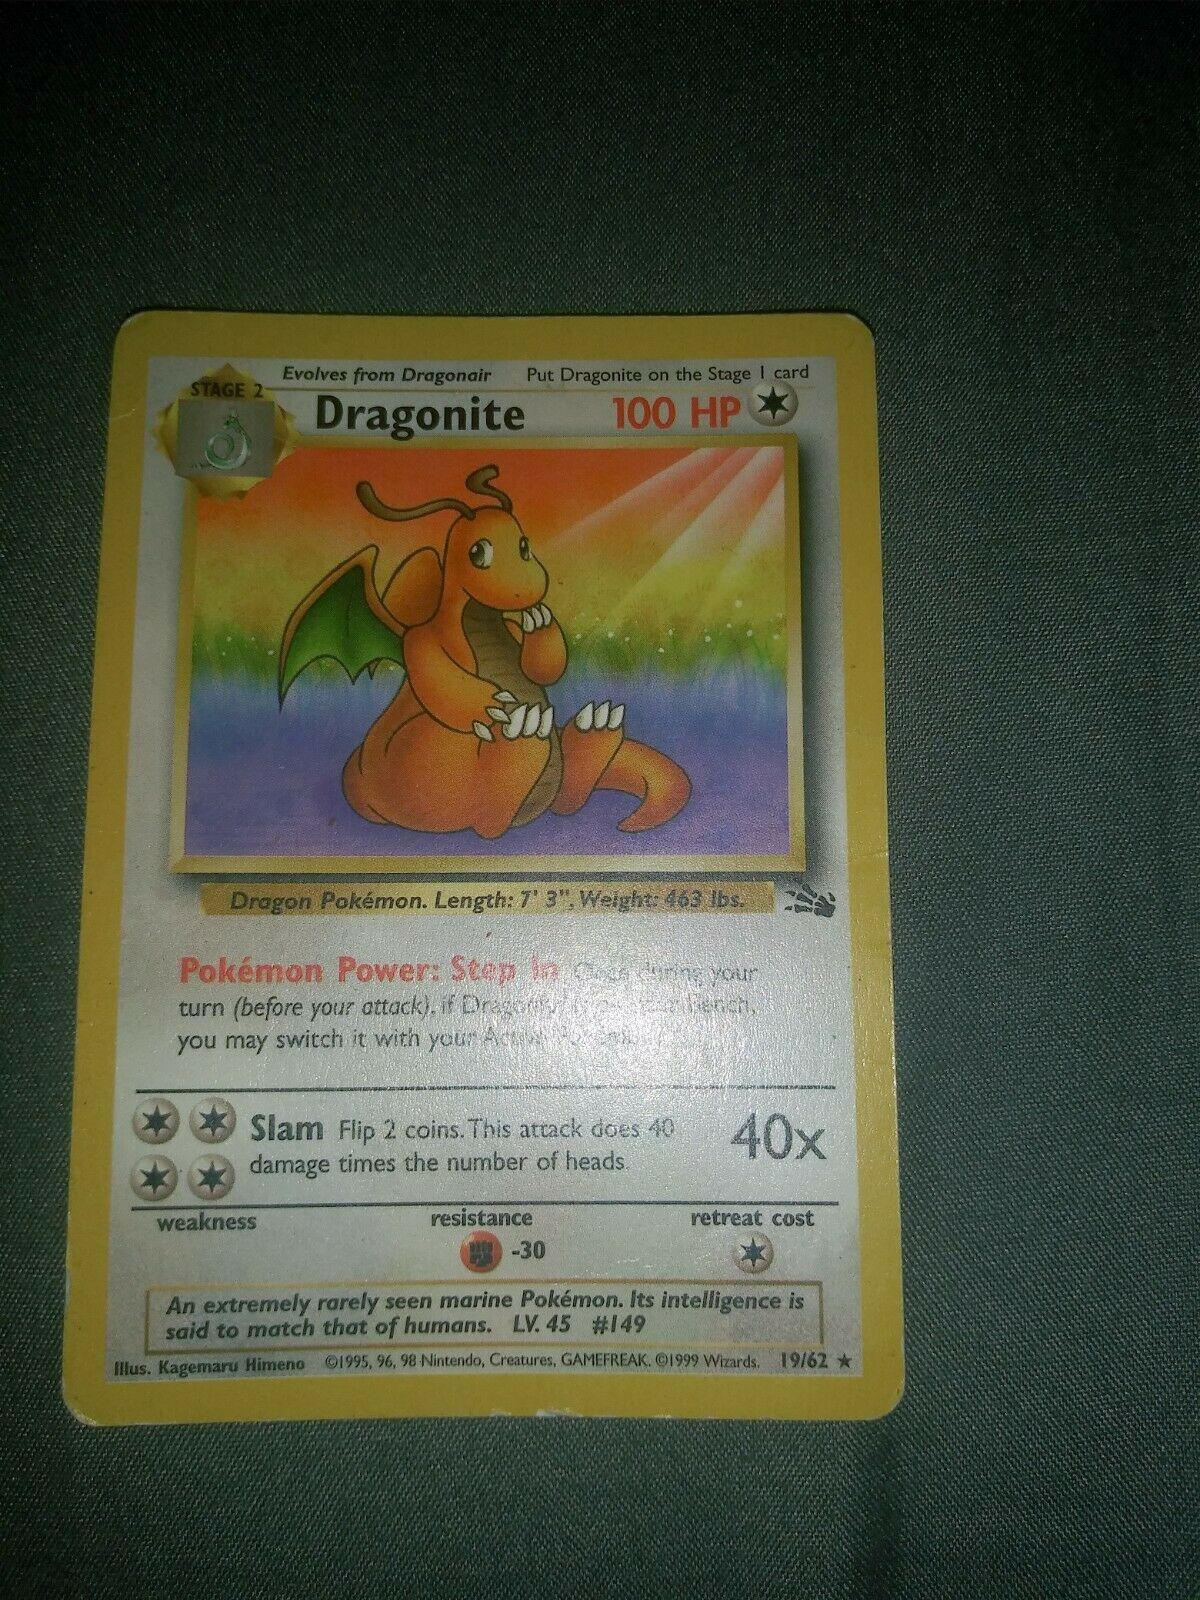 1995 Dragonite Edition Pokemon Card 1962 first edition